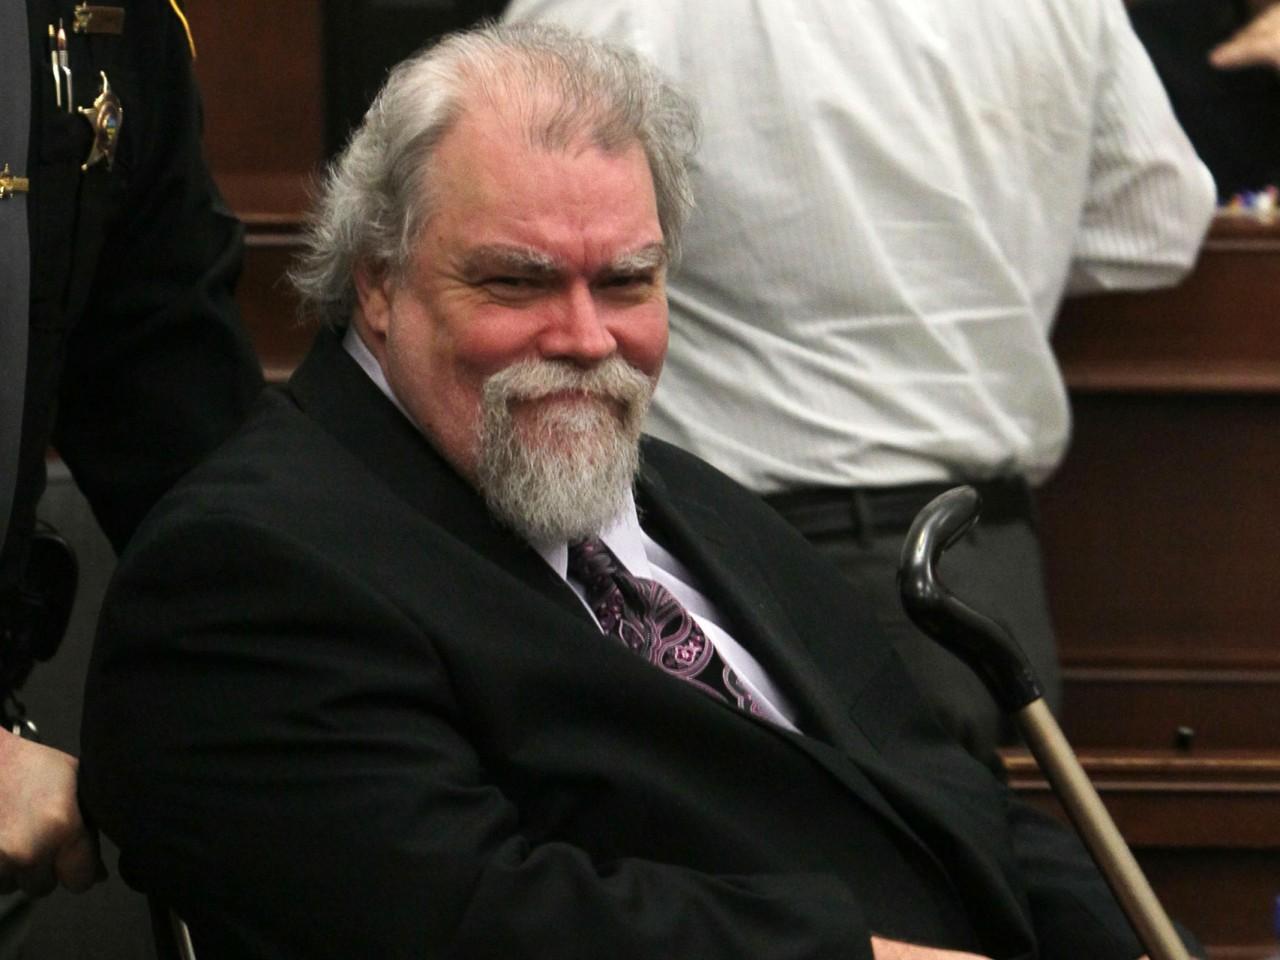 Craigslist Killer sentenced to death - Salon.com